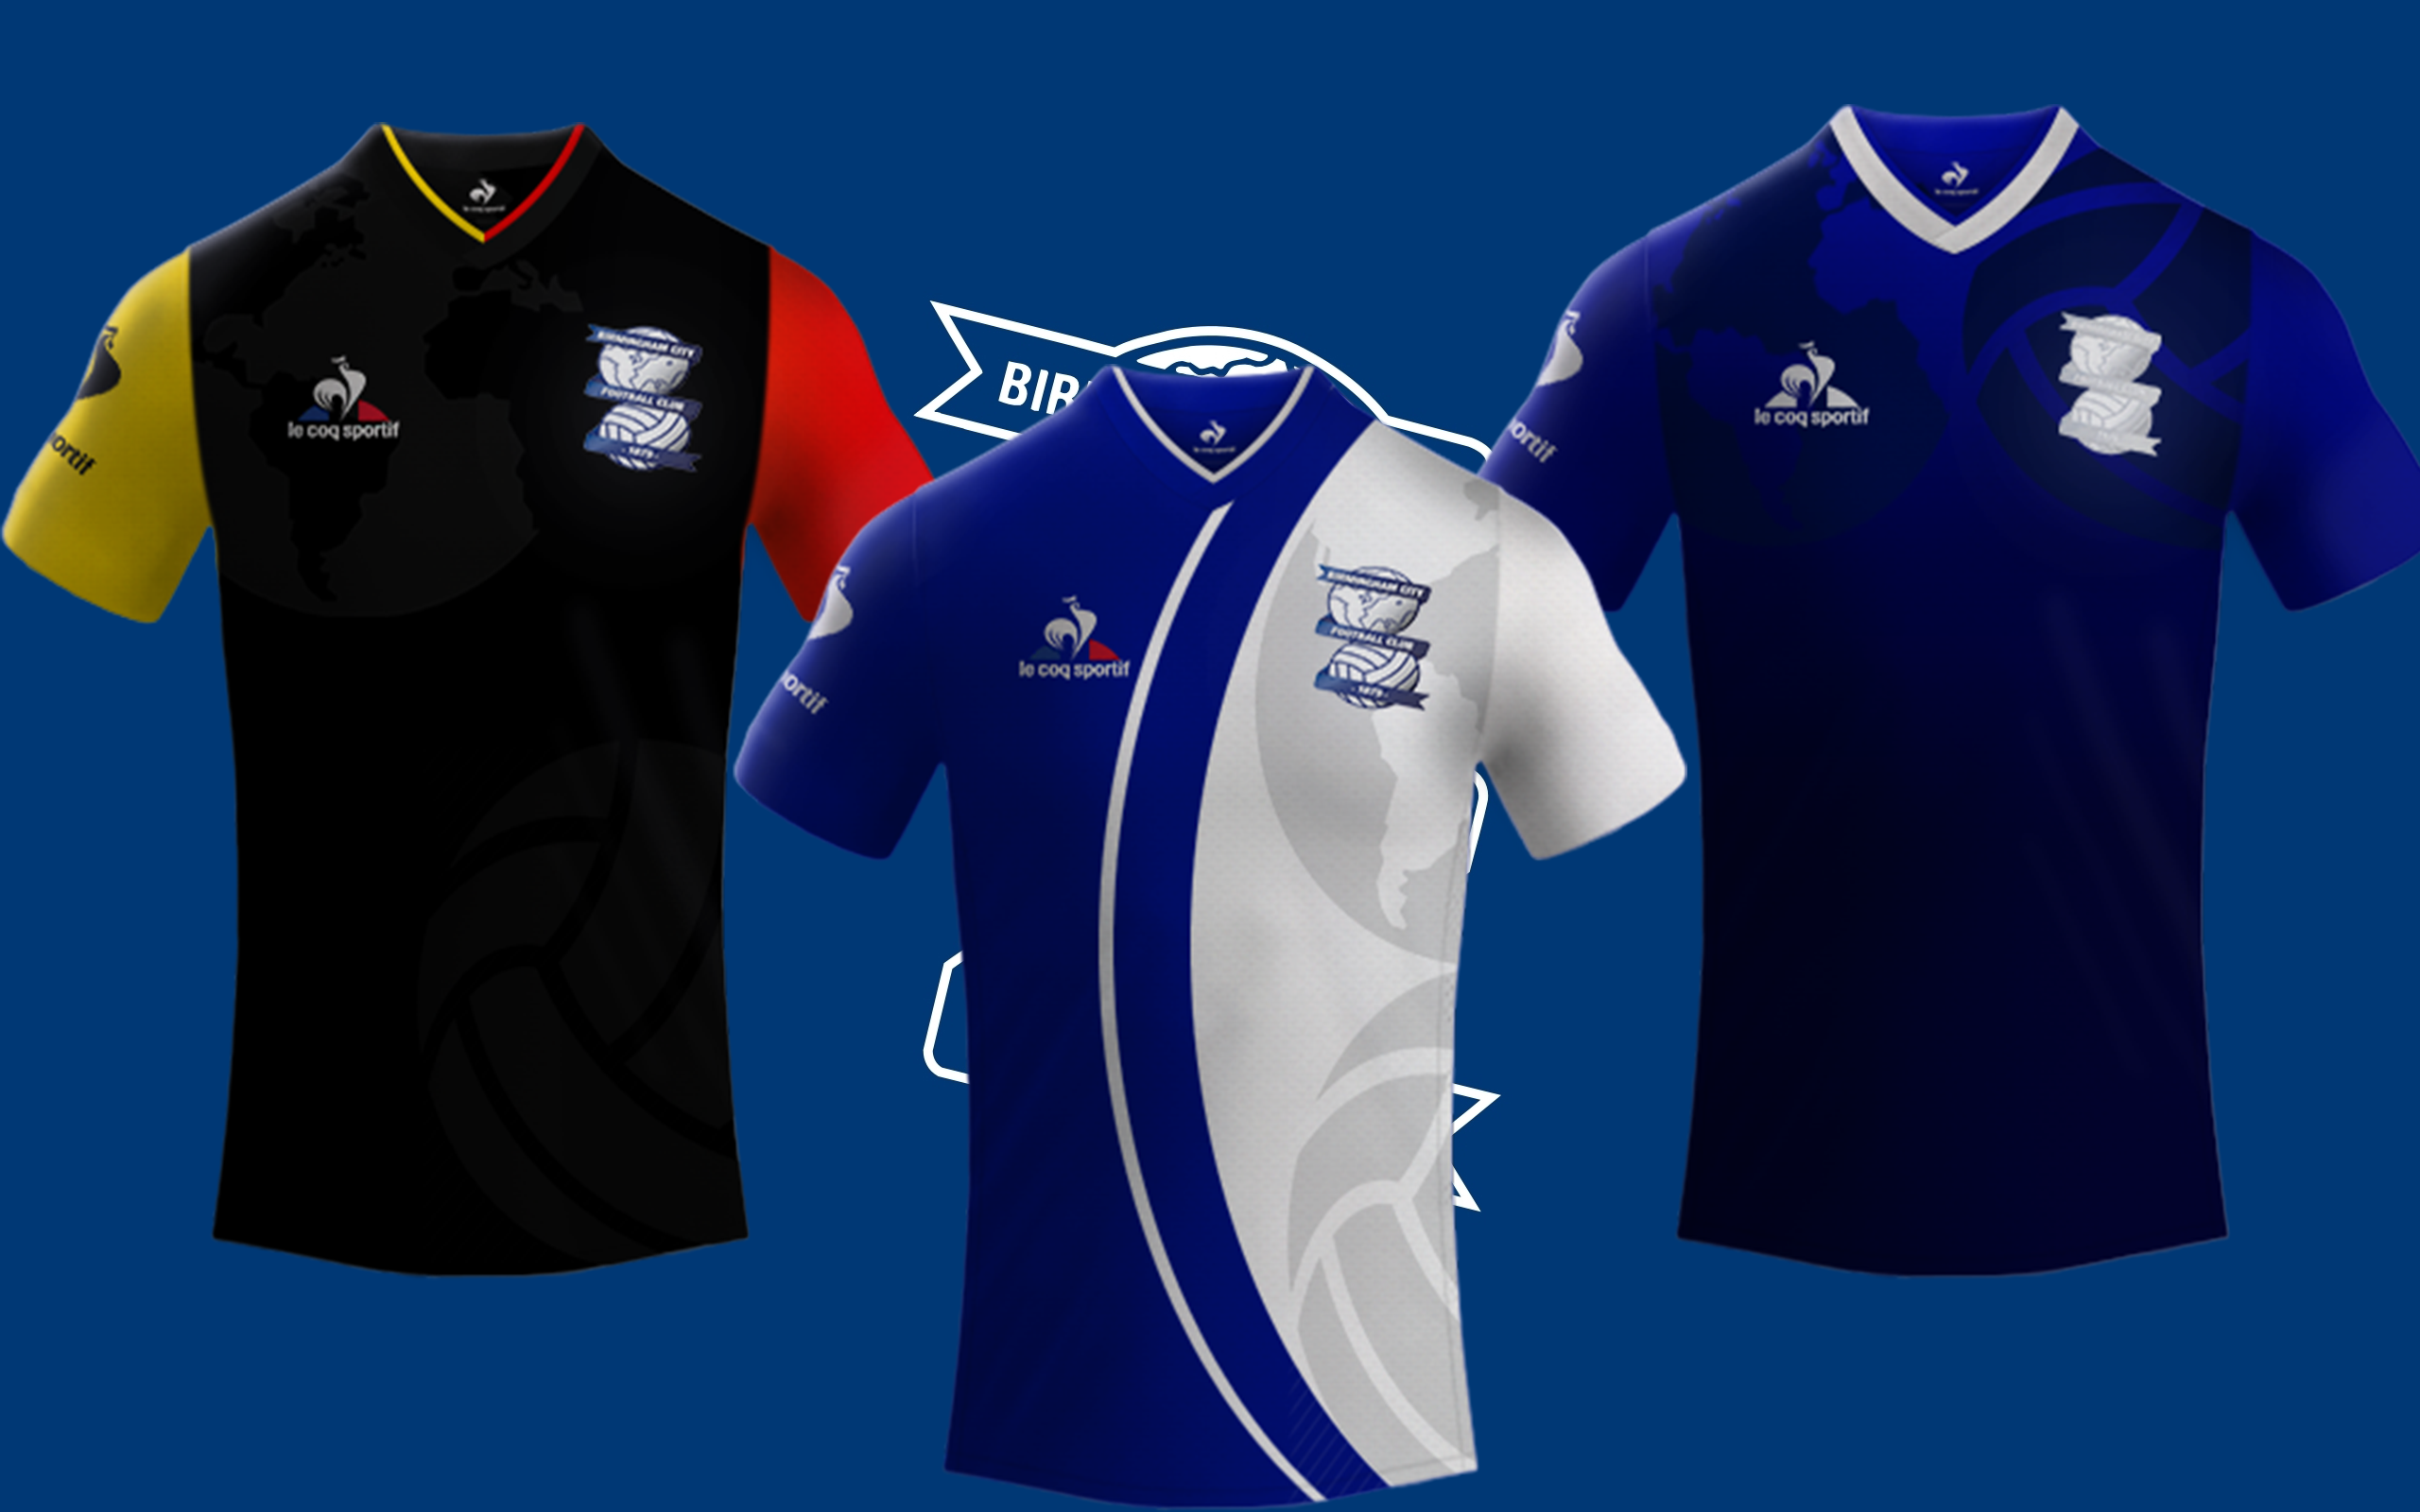 Birmingham City Fc / Le Coq Sportif Kits